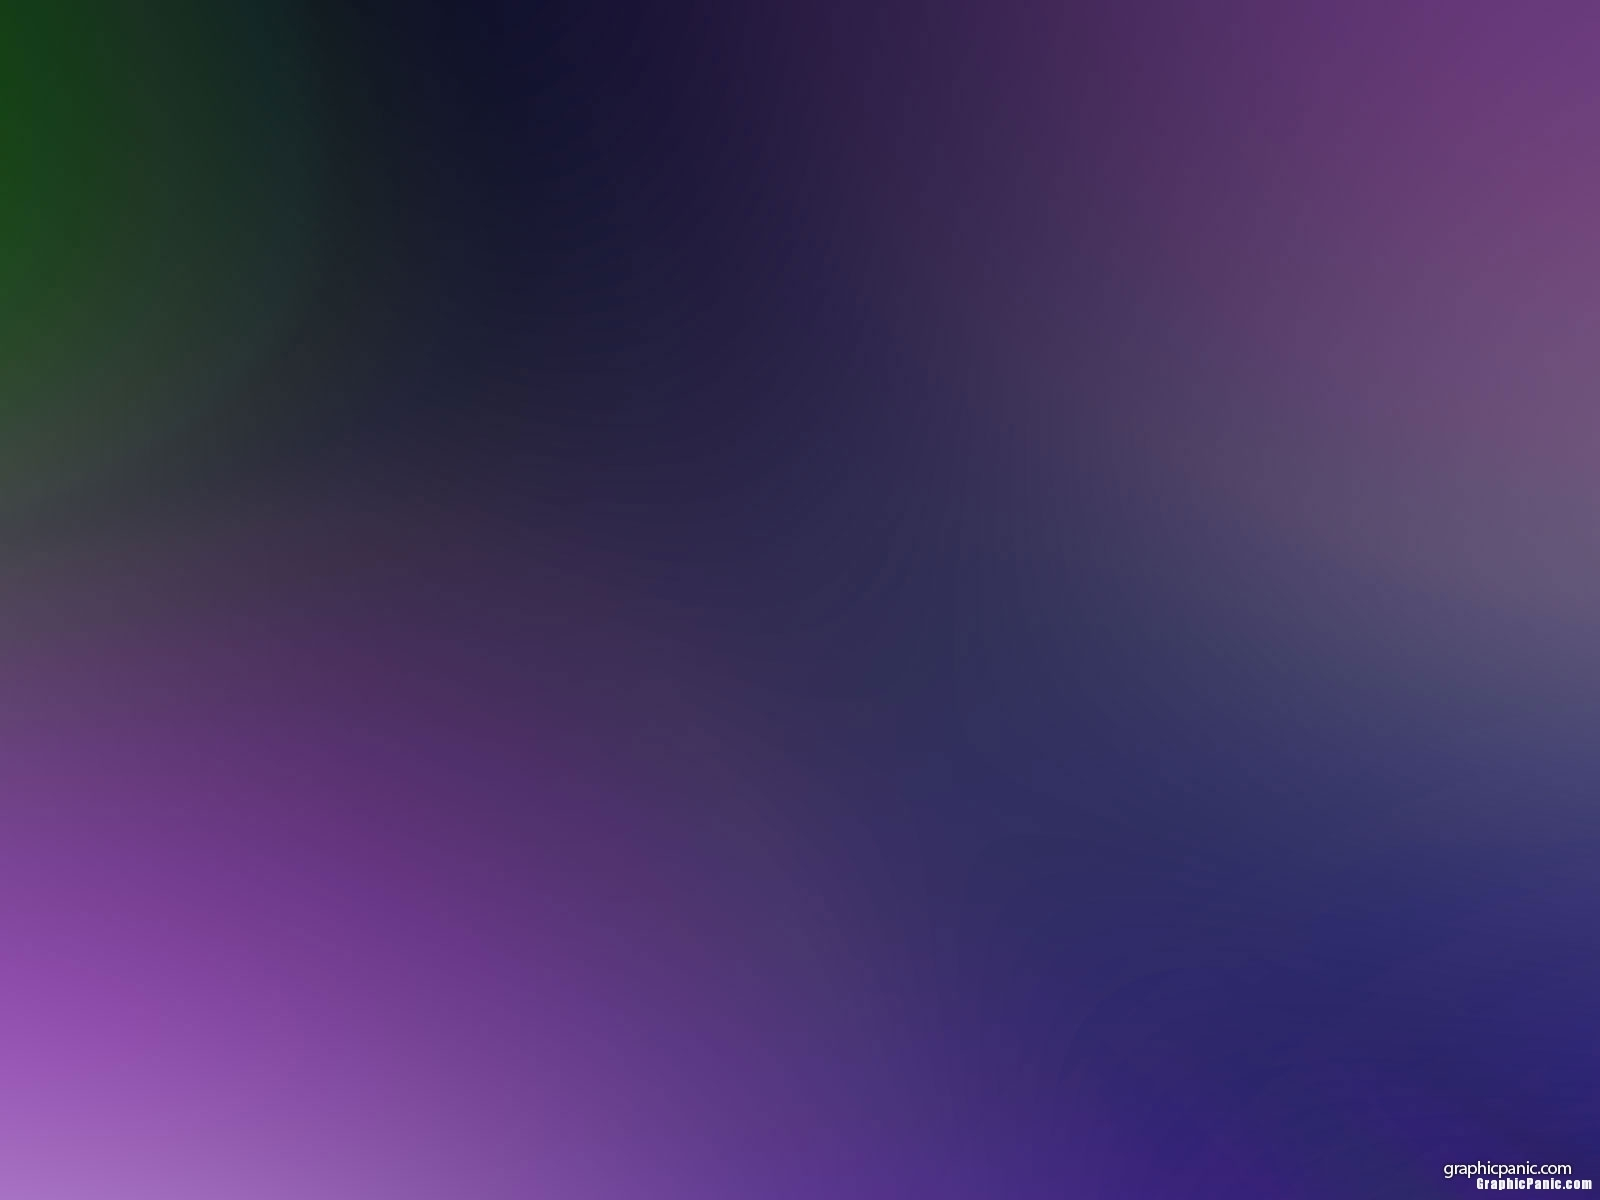 blue purple shades background